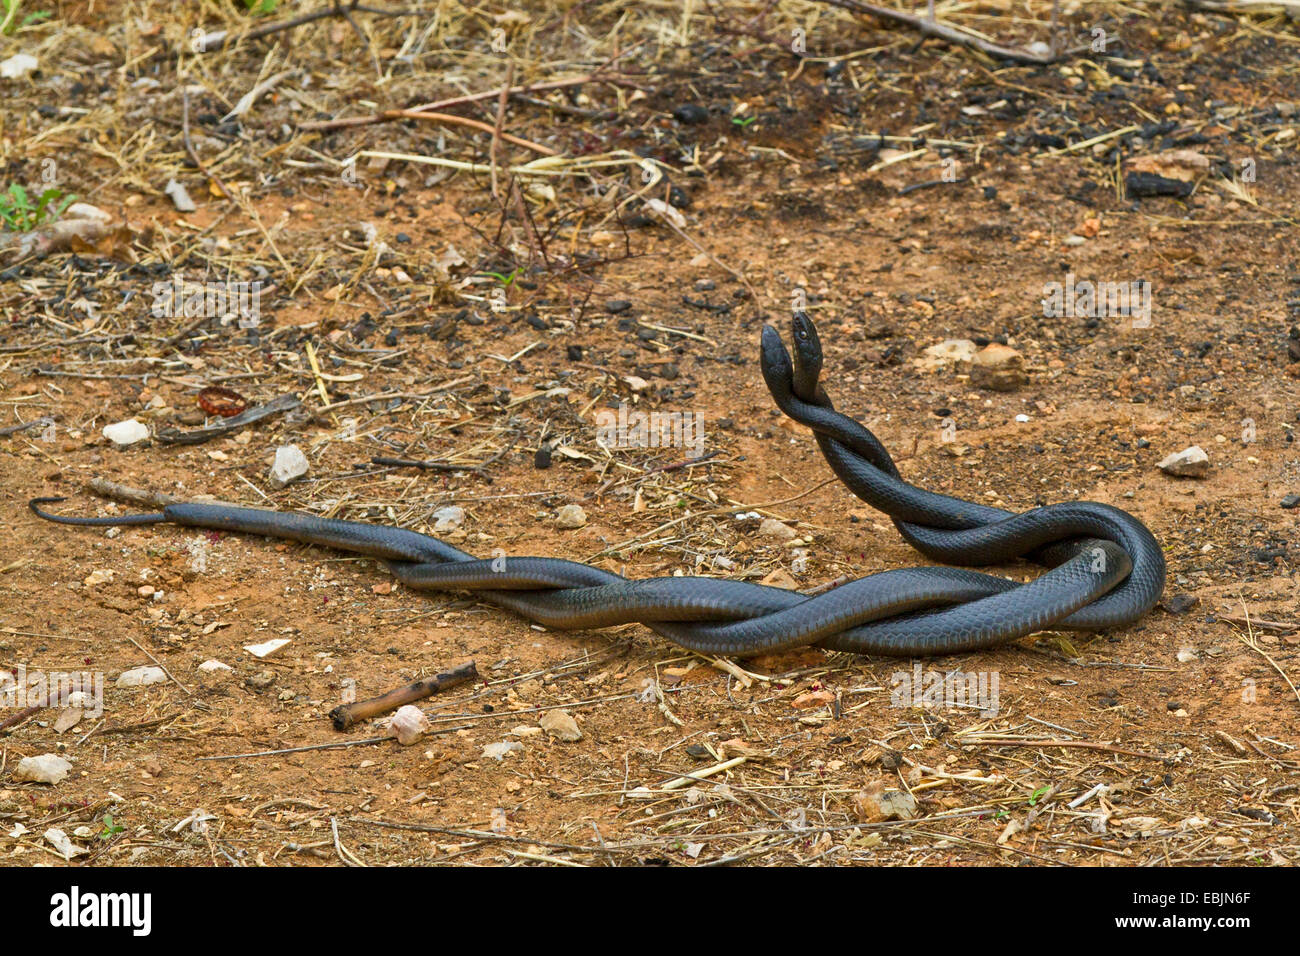 European whip snake, western European whip snake, dark-green whipsnake (Coluber viridiflavus, Hierophis viridiflavus - Stock Image